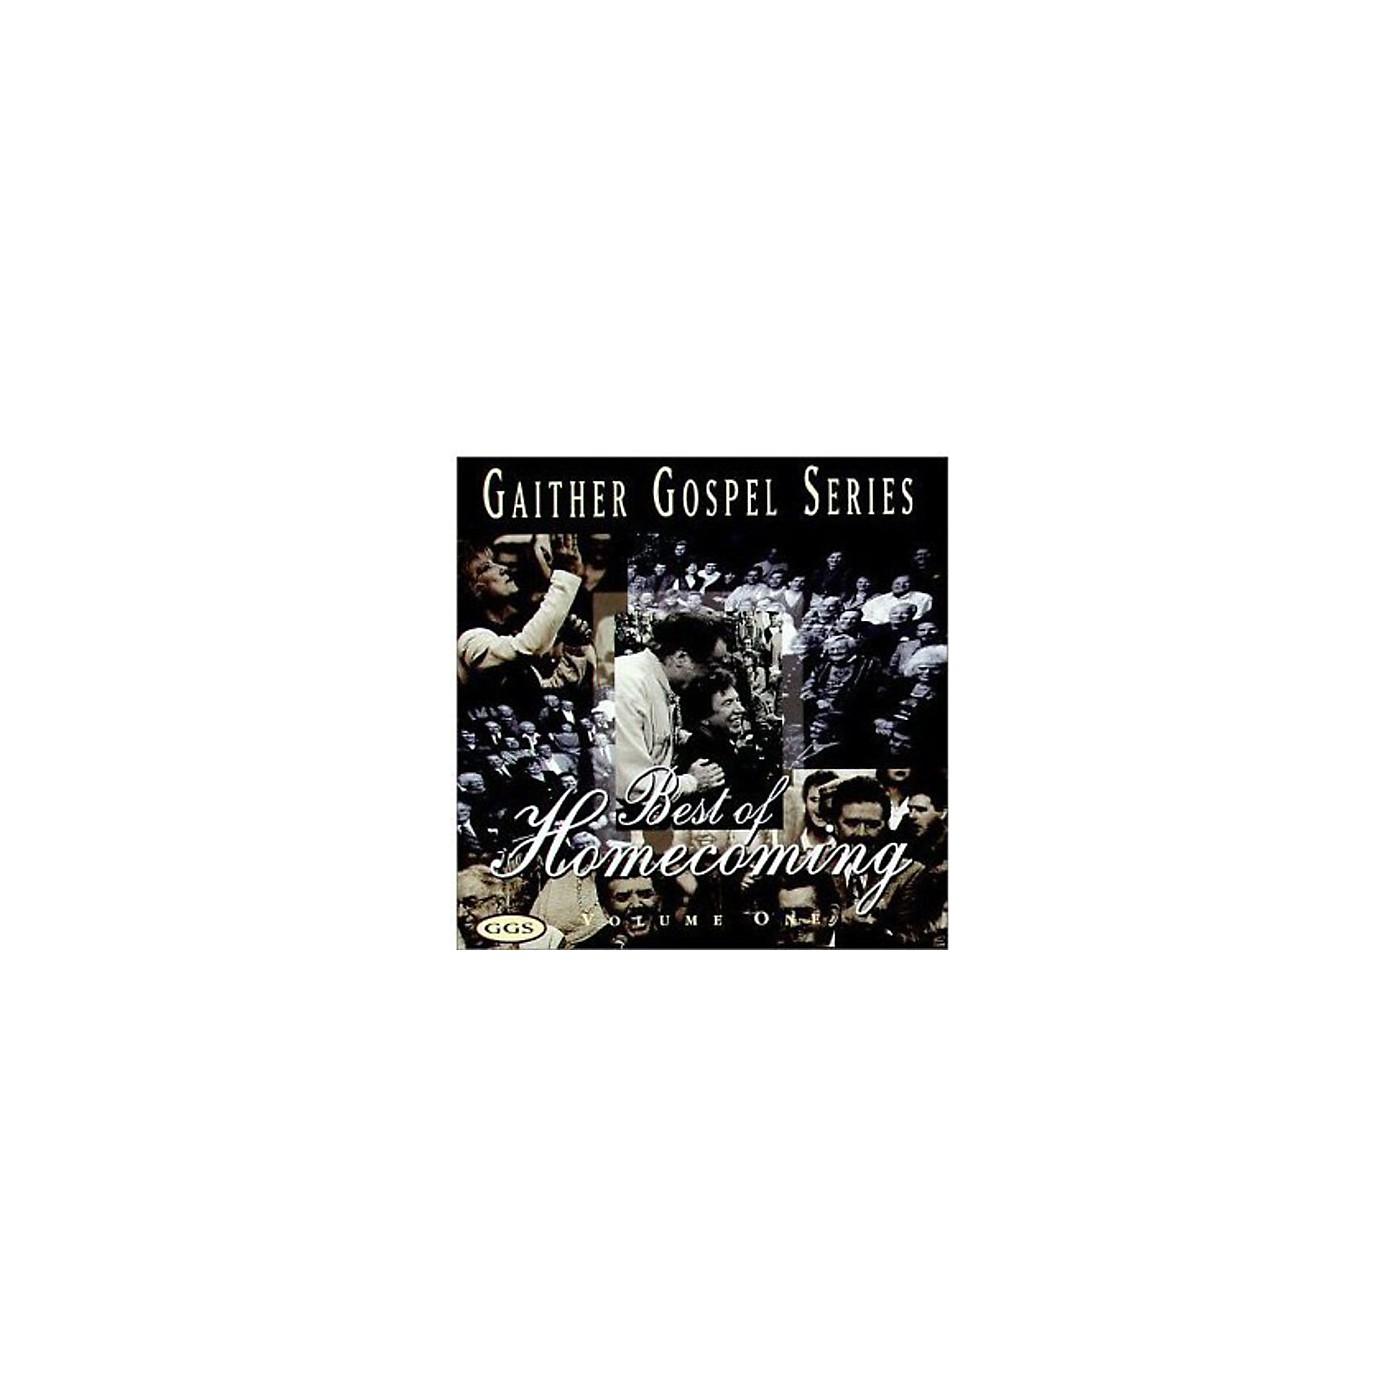 Alliance Bill & Gloria Gaither - Best of Homecoming 1 - Gaither Gospel Series (CD) thumbnail